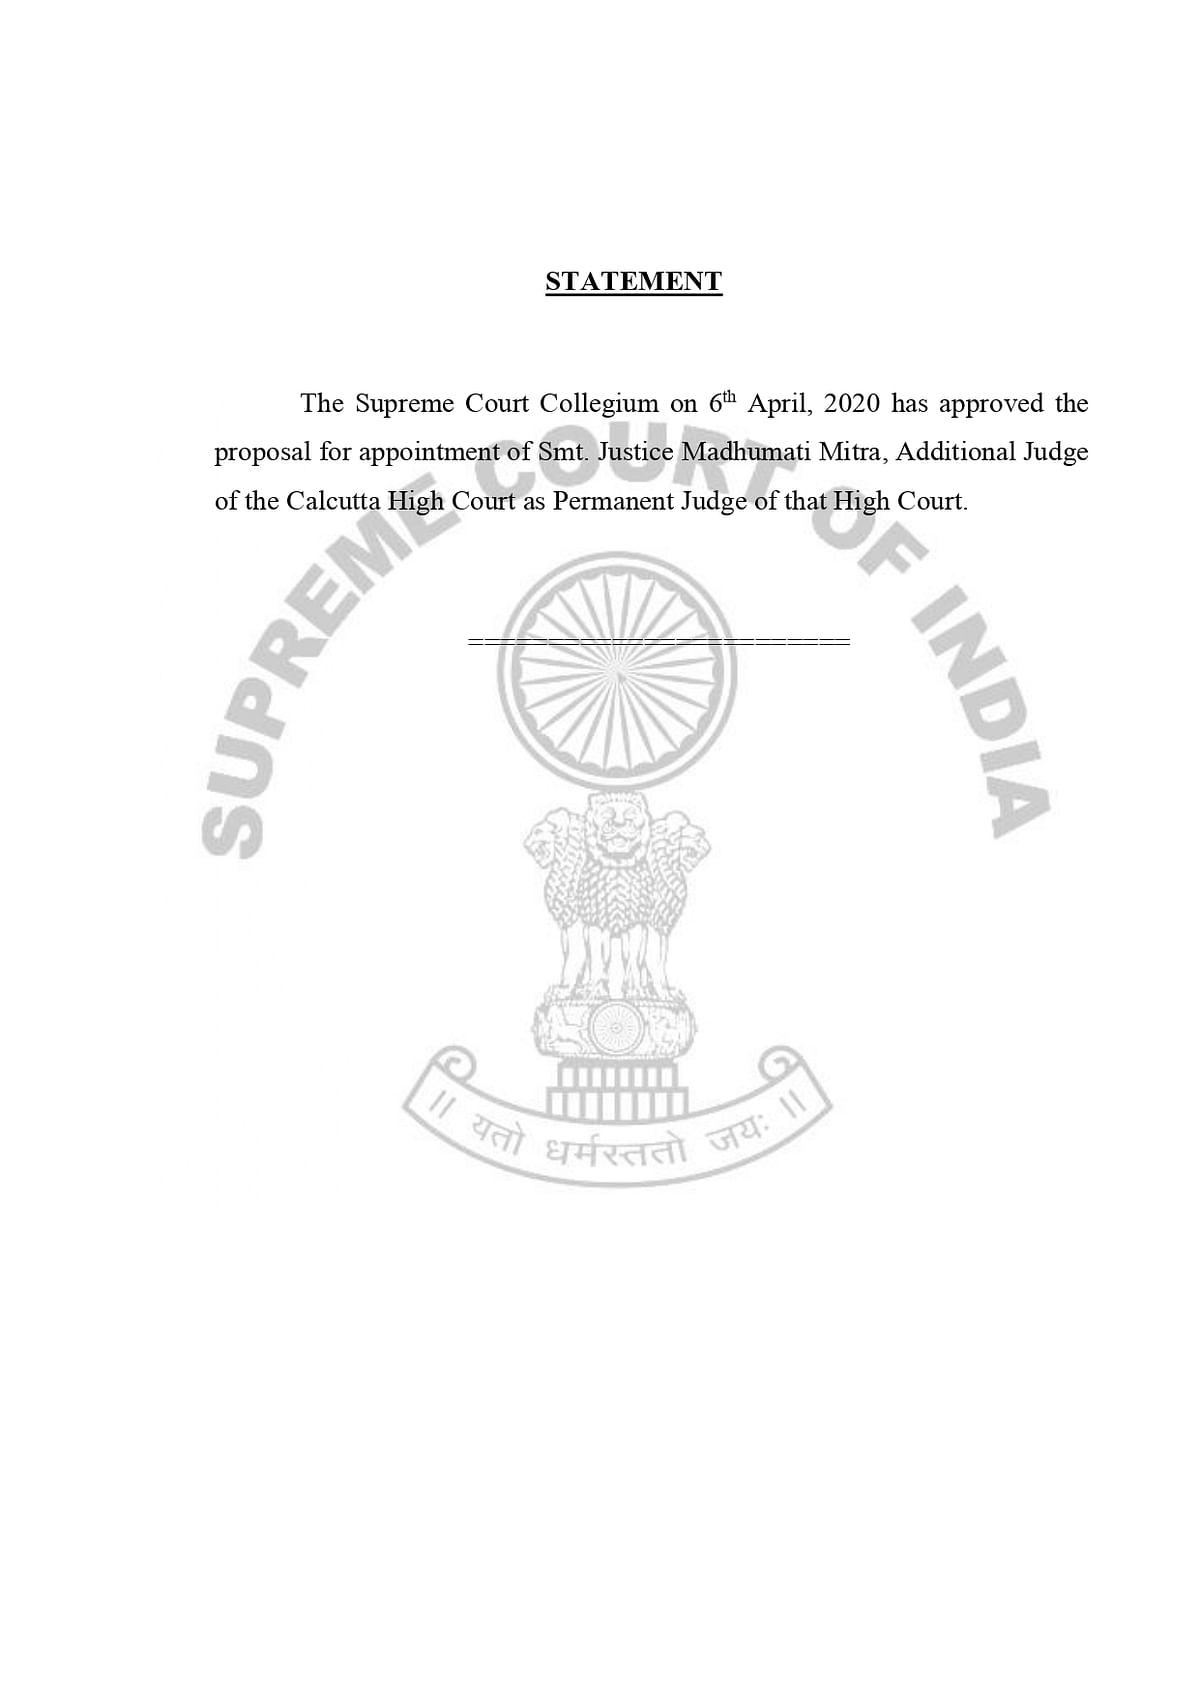 Collegium Statement recommending Justice Madhumati Mitra as a permanent High Court judge